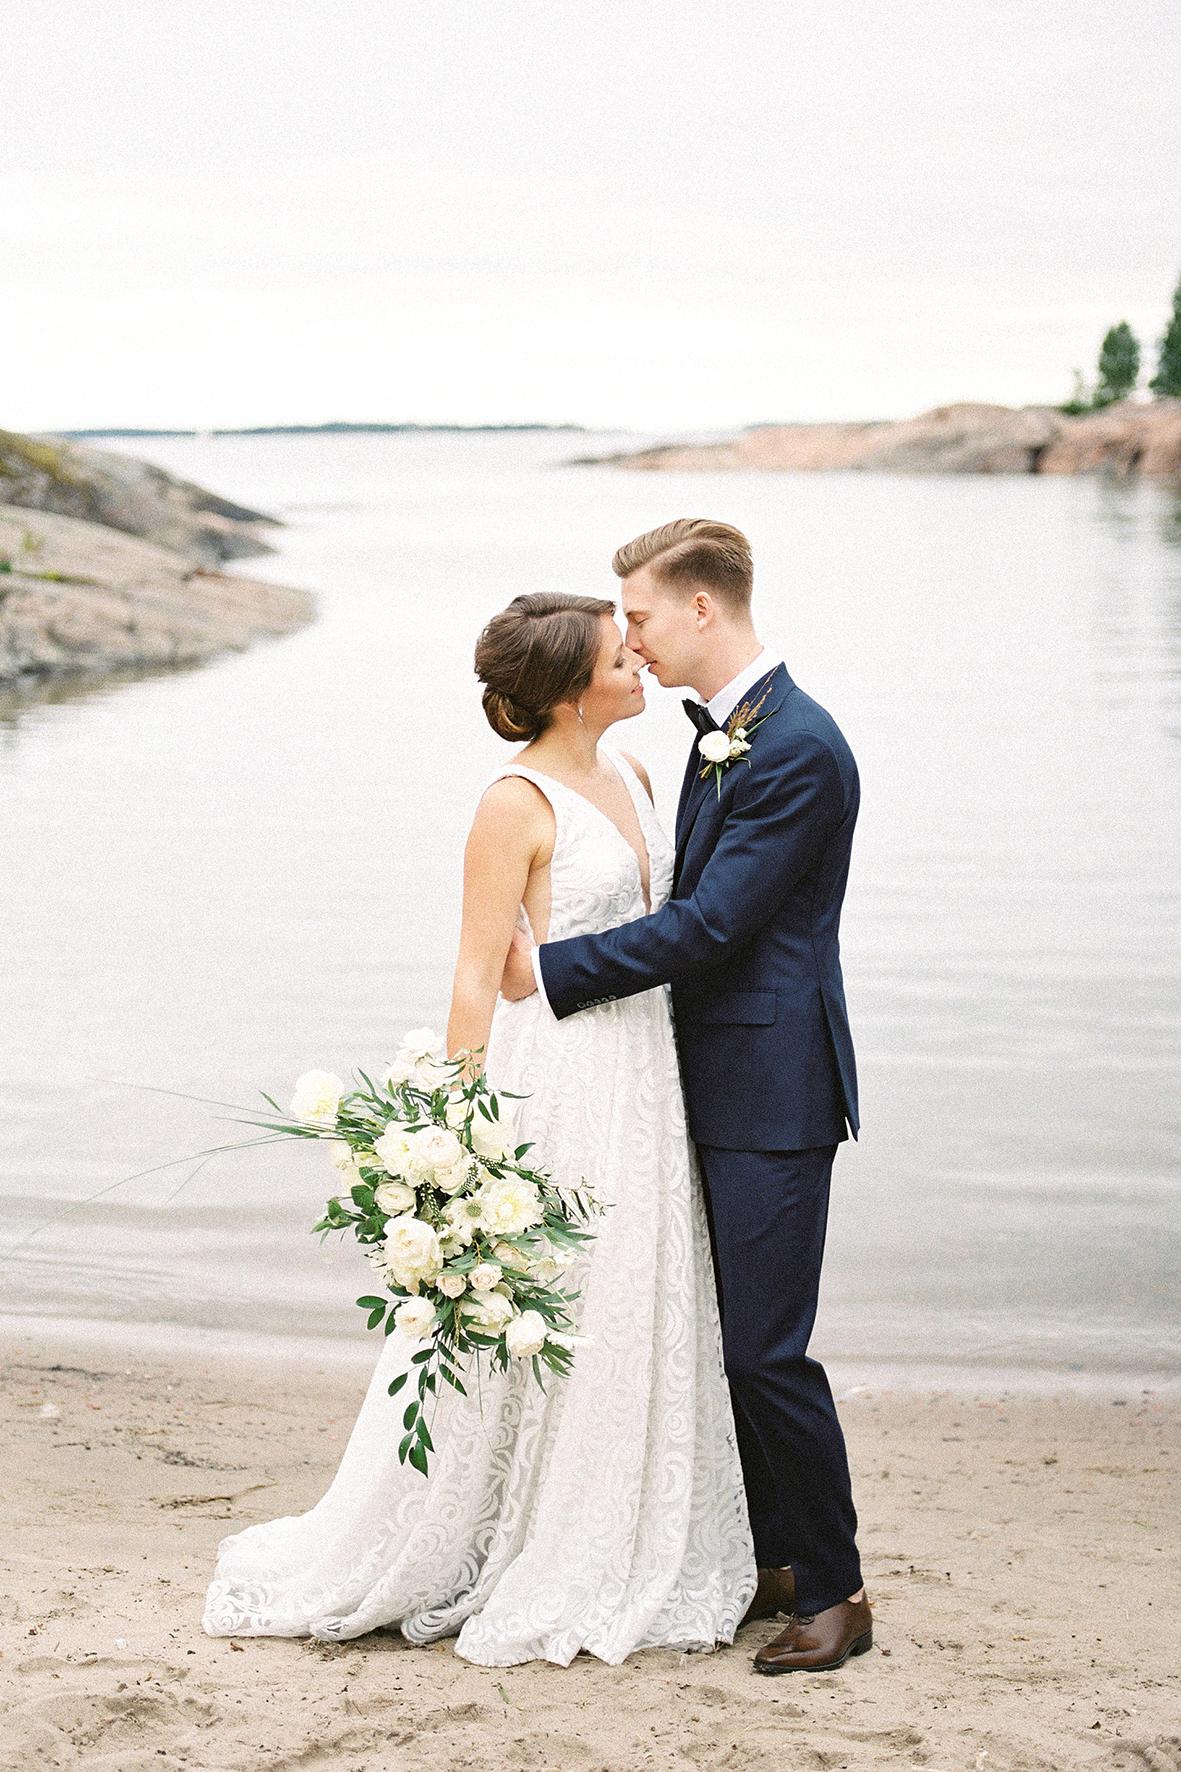 Nautical Inspired Wedding Shoot for Häät Magazine